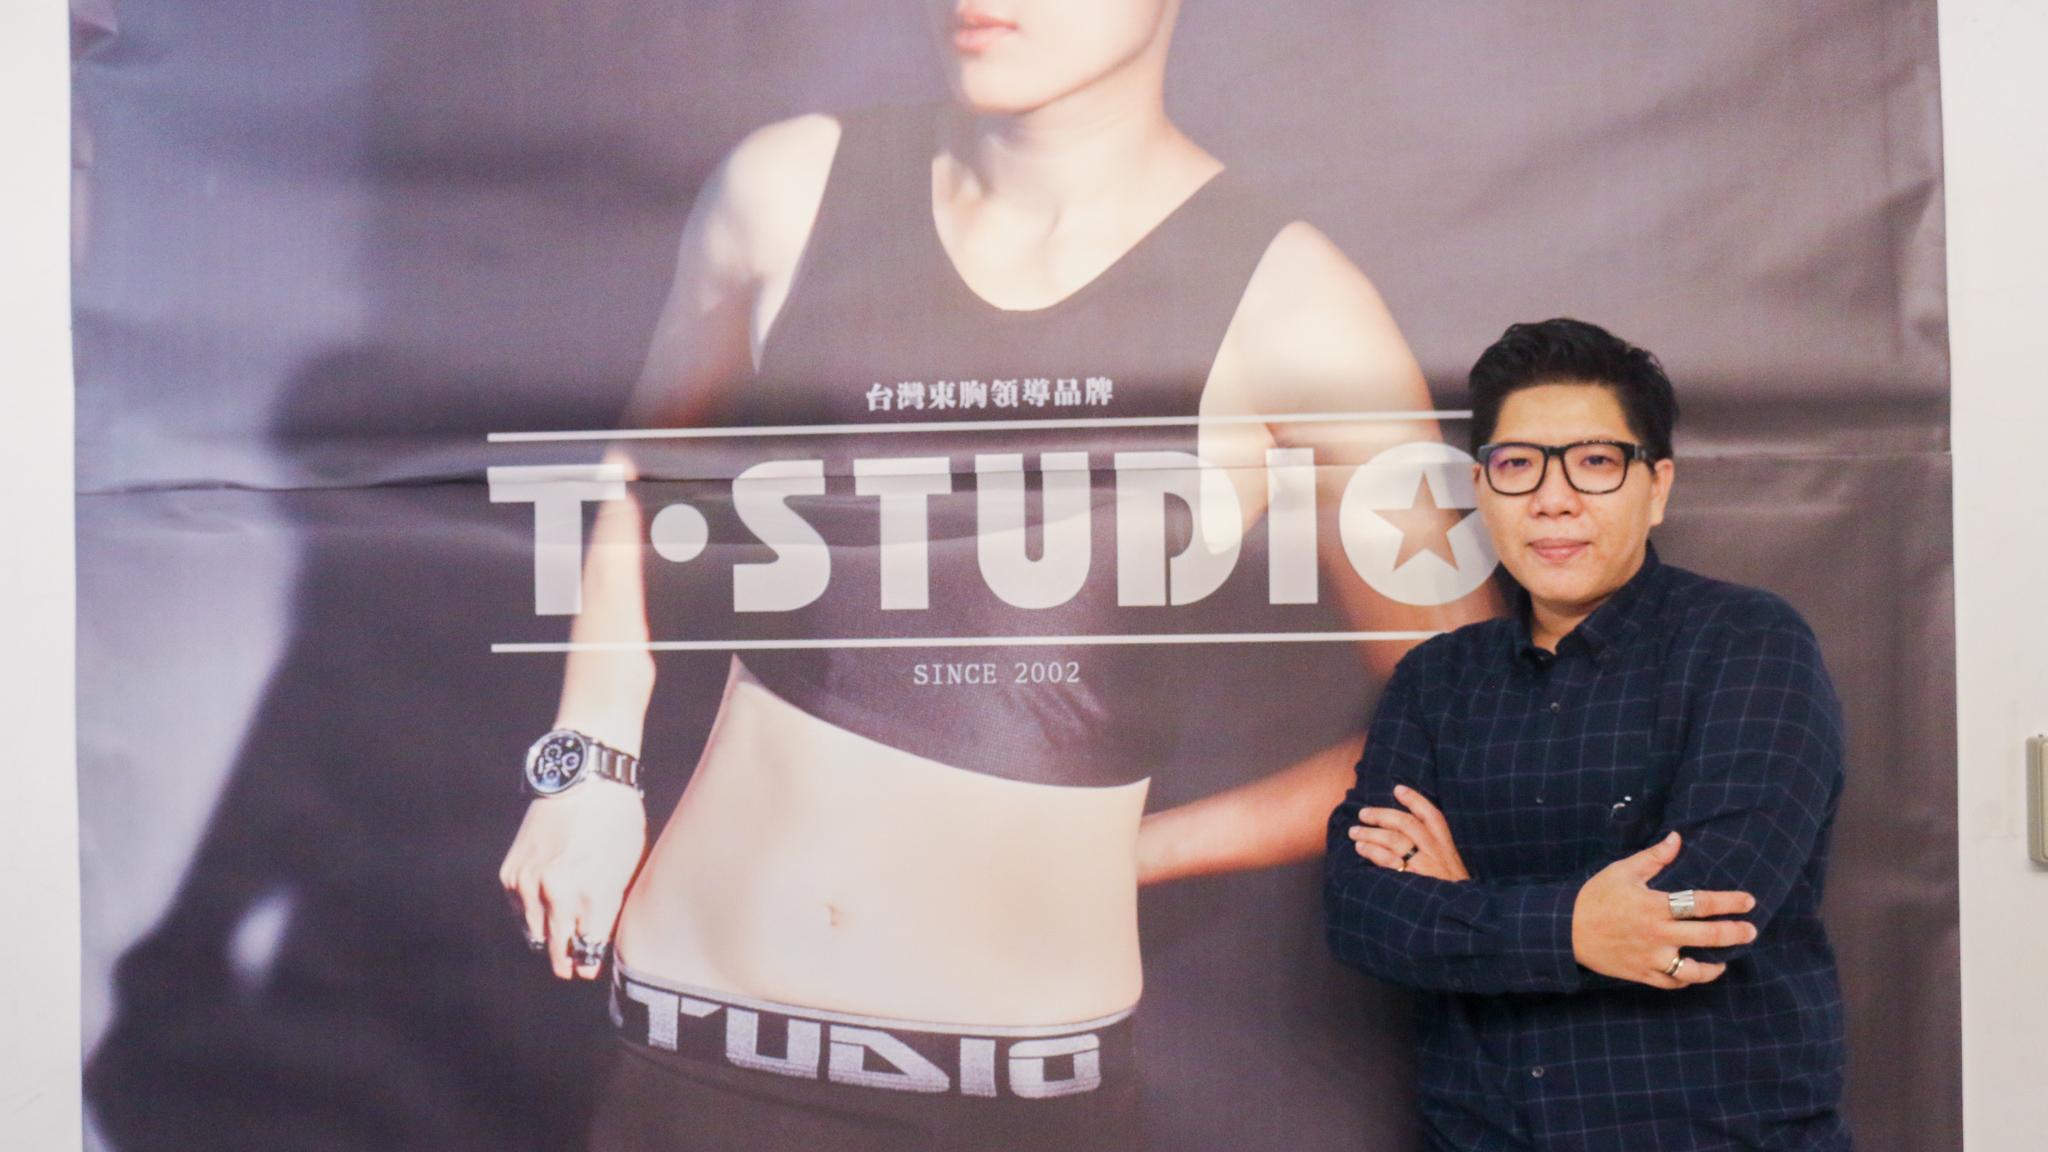 T-Studio:小眾市場經營困難?束胸品牌運用「這些策略」突破重圍